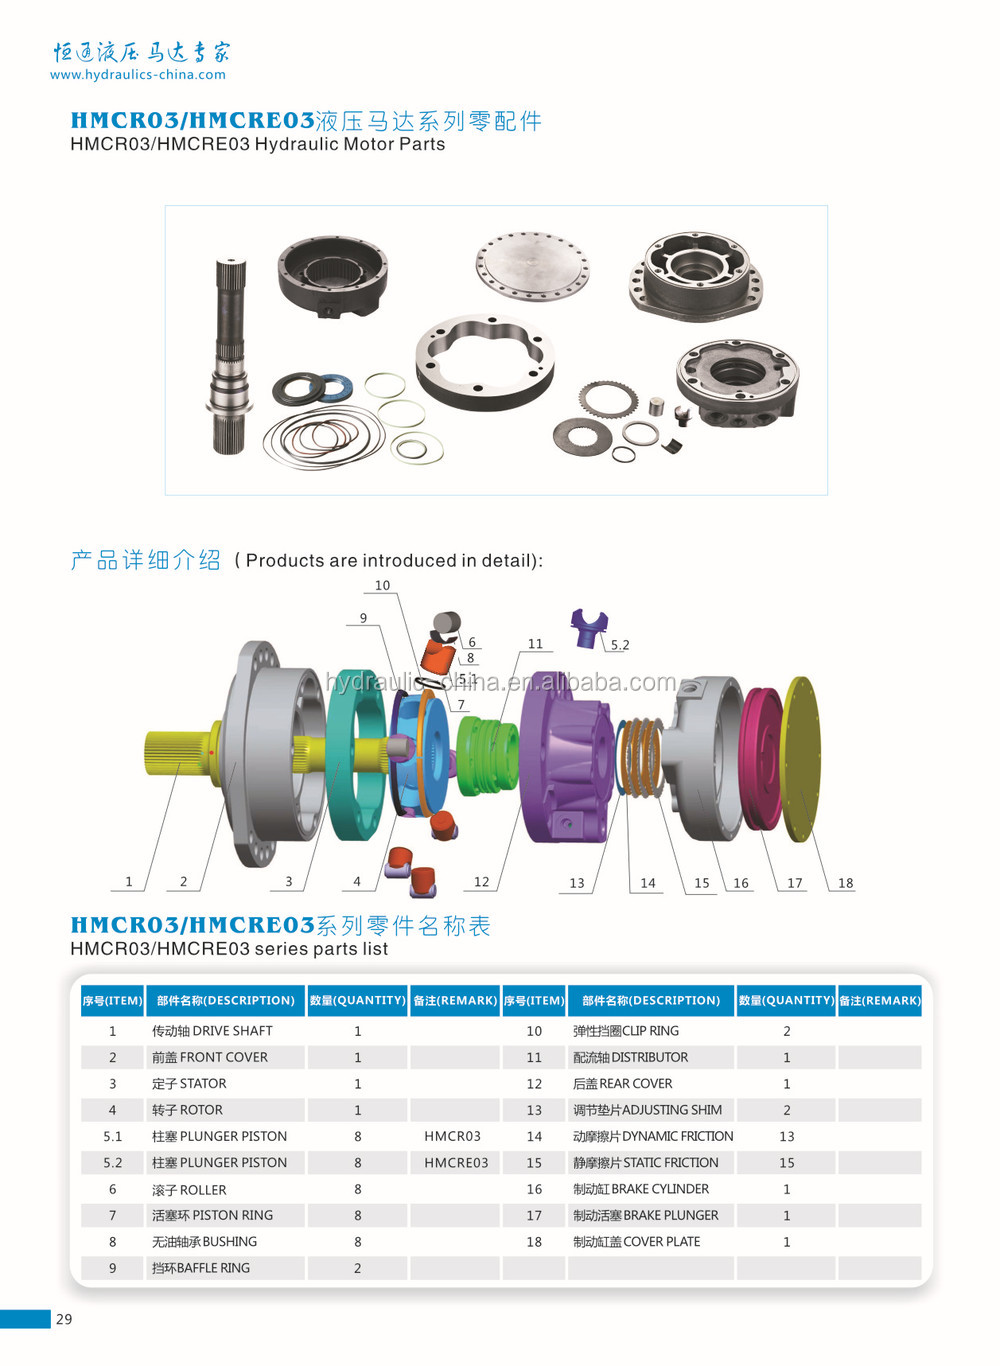 MCR03 parts list.jpg